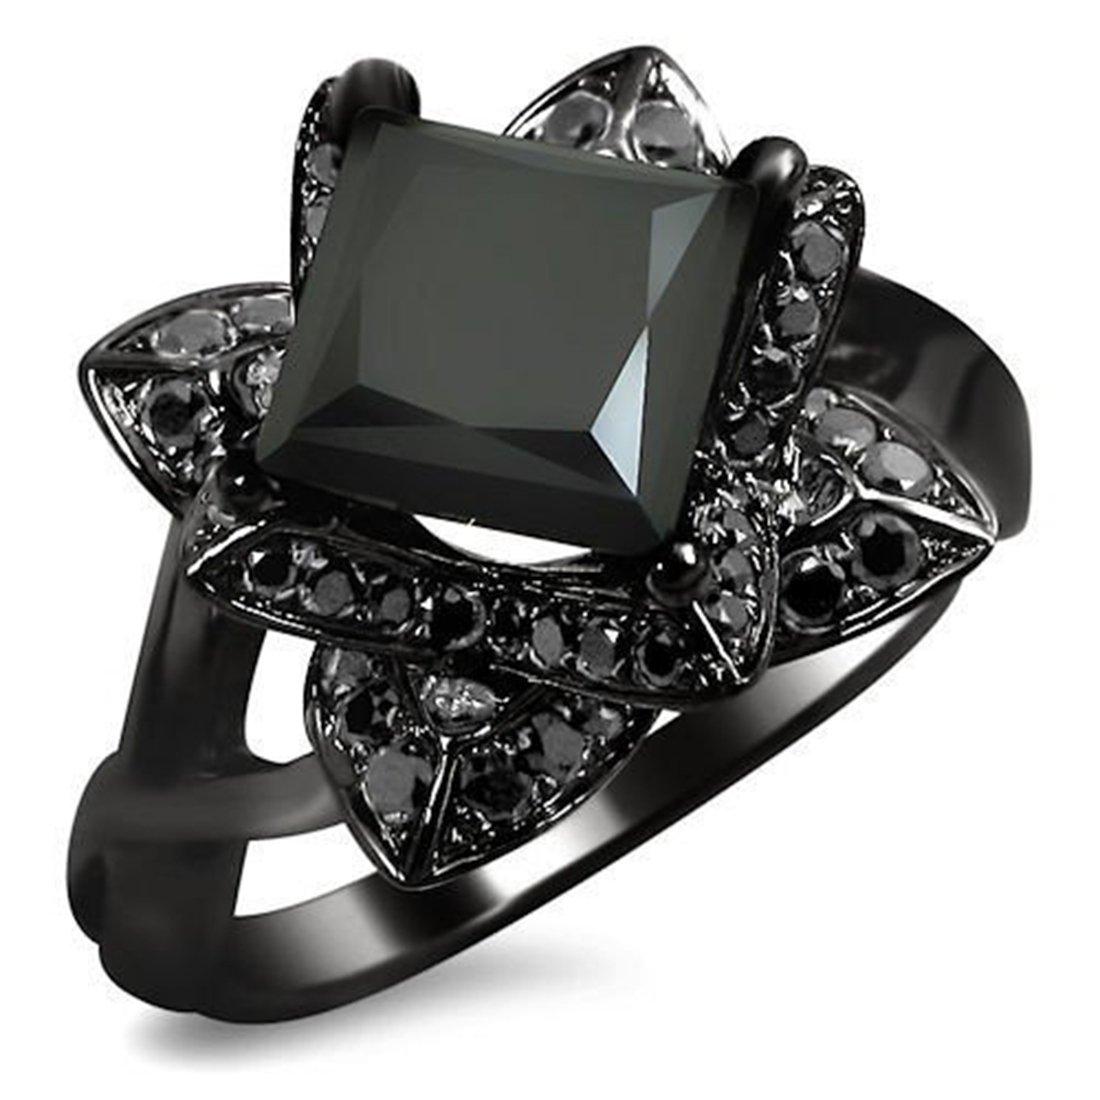 Smjewels 2.0 Ct Black Princess Cut Lotus Flower Sim.Diamond Engagement Ring 14K Black Gold Fn